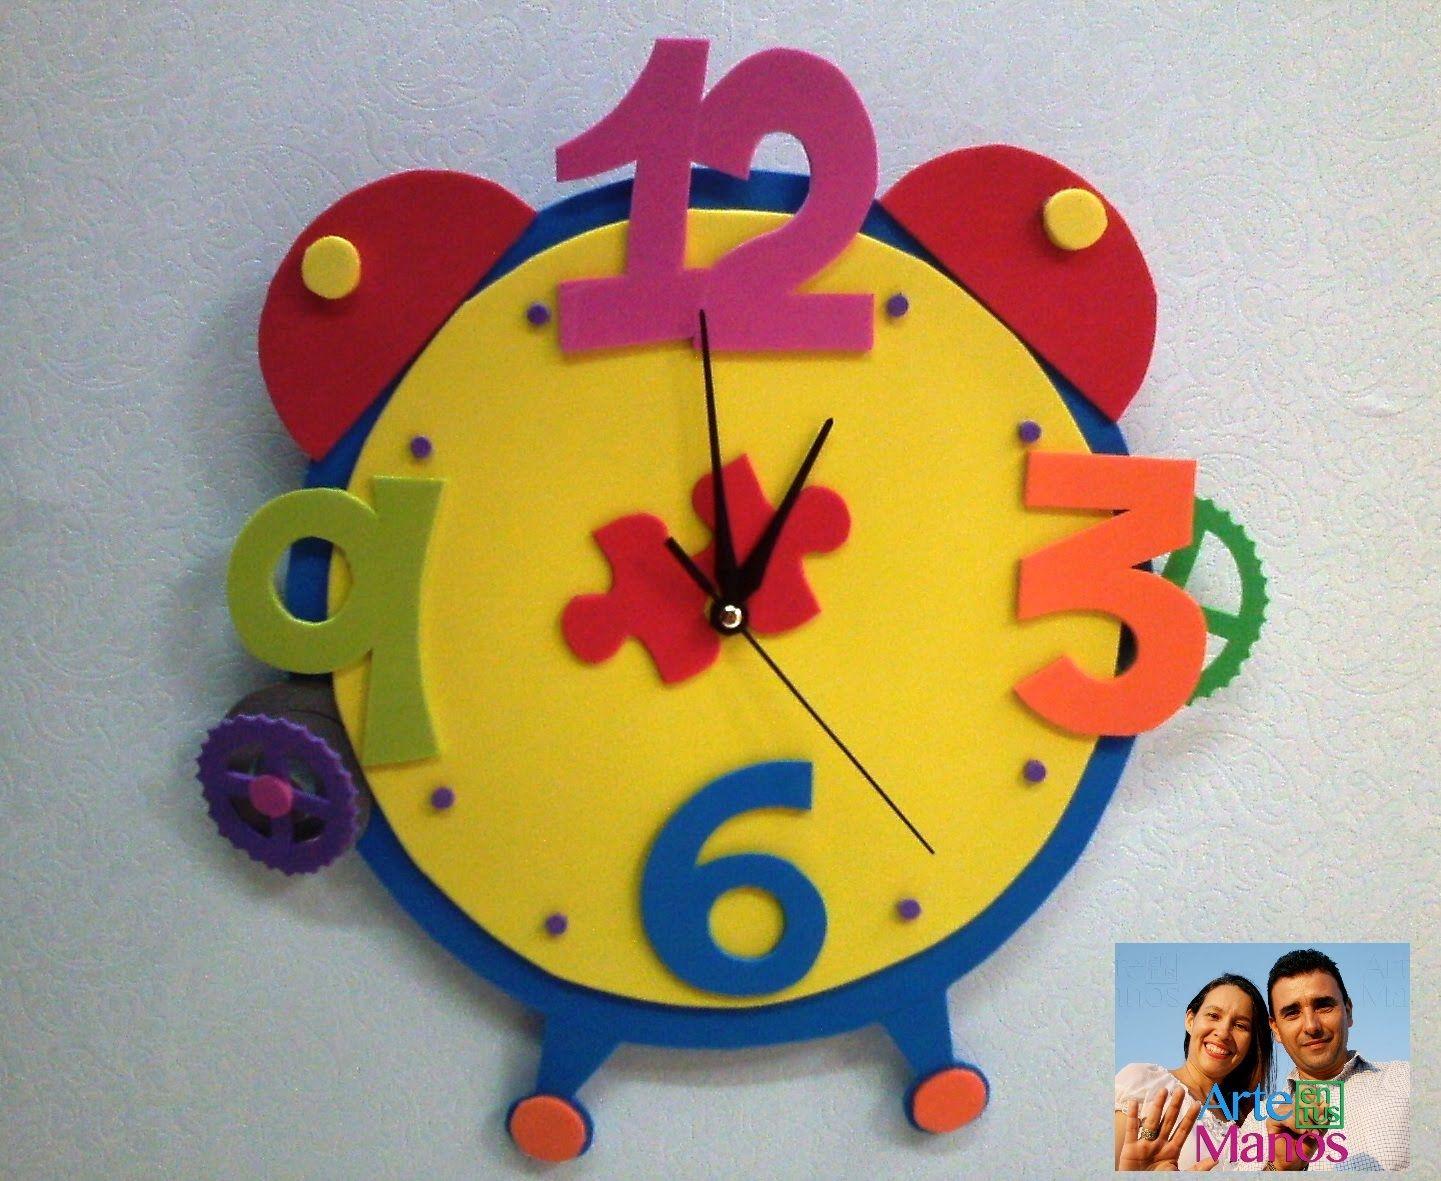 Reloj en foami con mecanismo paso a paso foami clock - Manualidades relojes infantiles ...